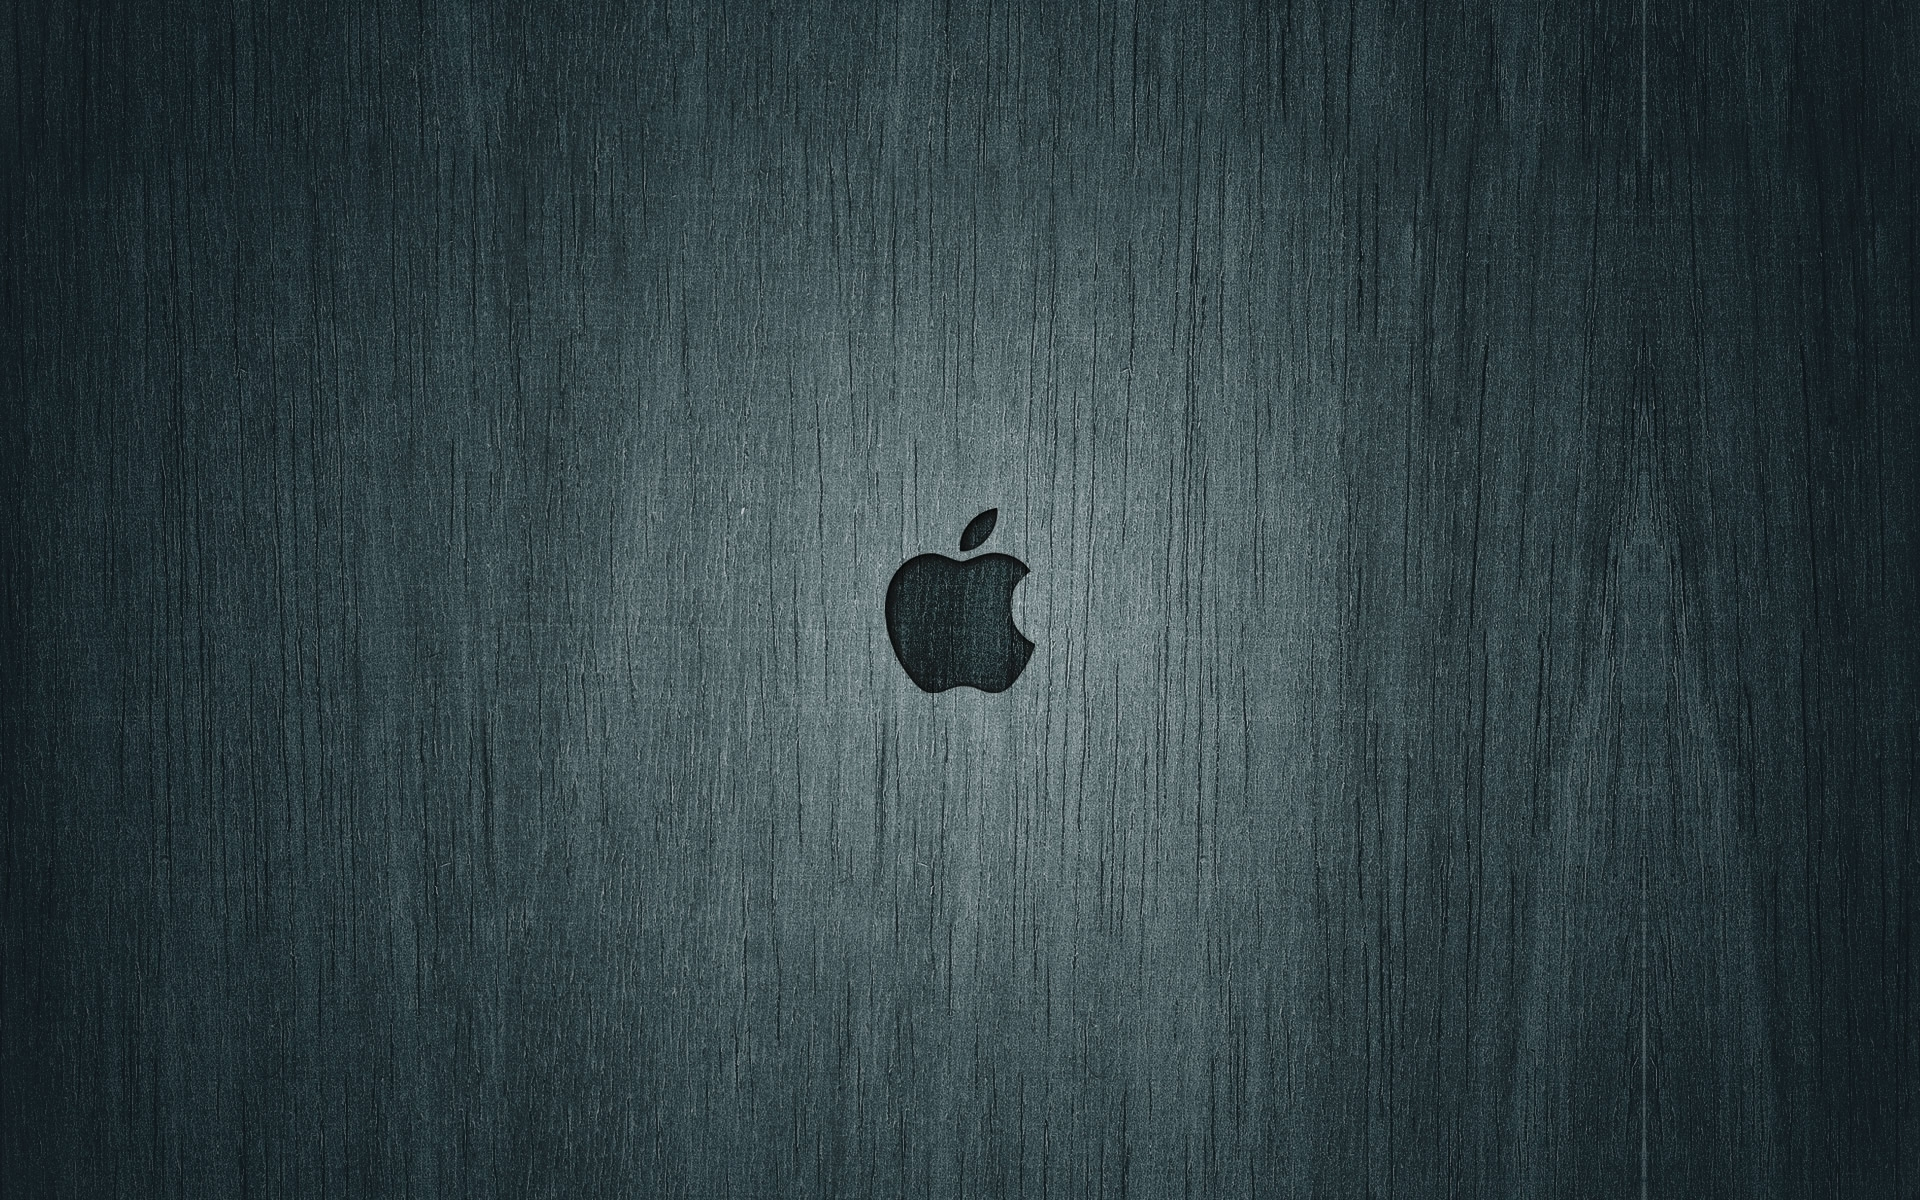 apple wallpapers desktop group (86+)